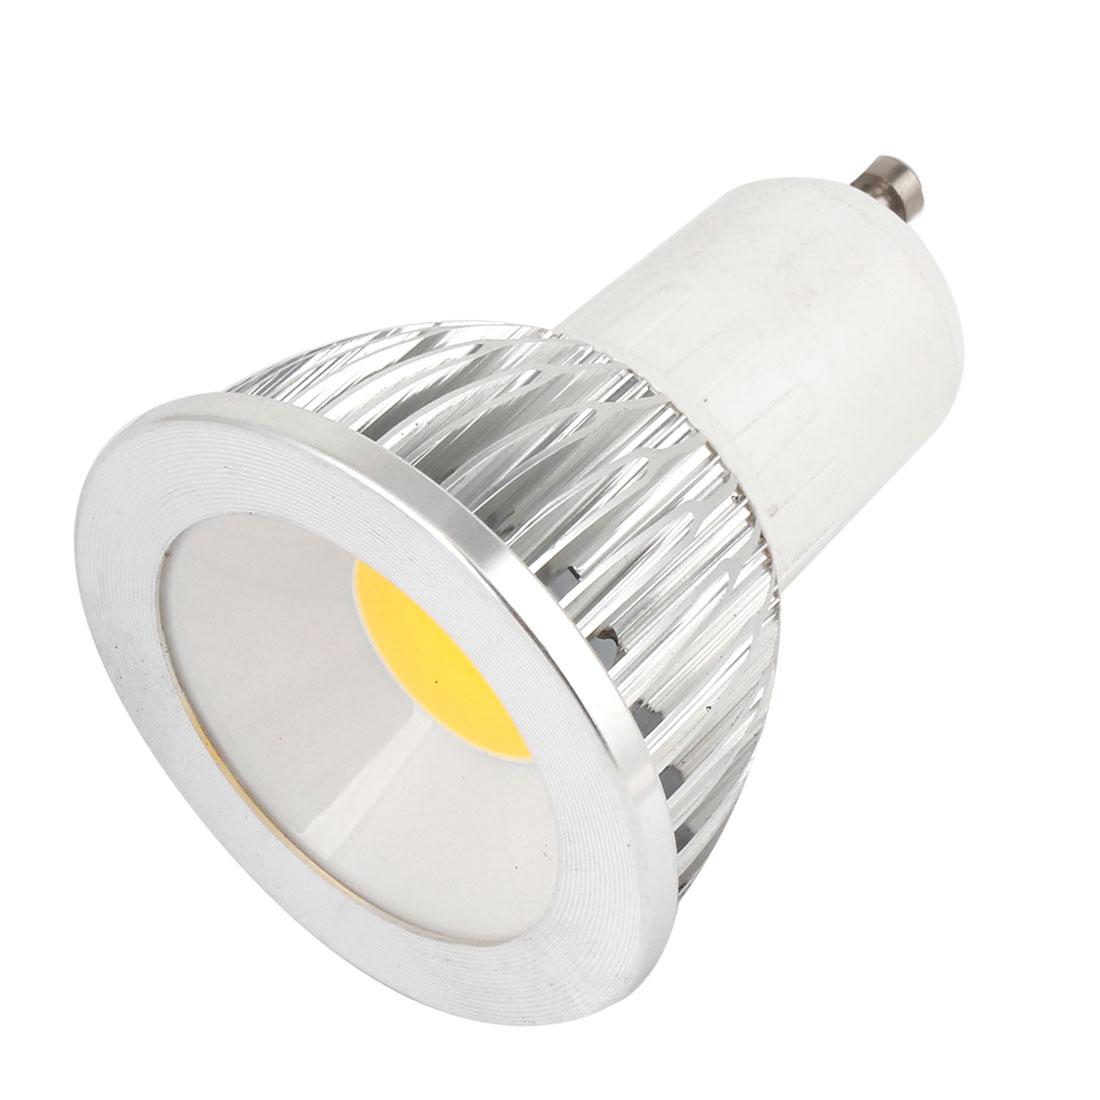 AC 85-265V 6W 360-390LM GU10 Dimmable Warm White Light COB LED Downlight Lamp